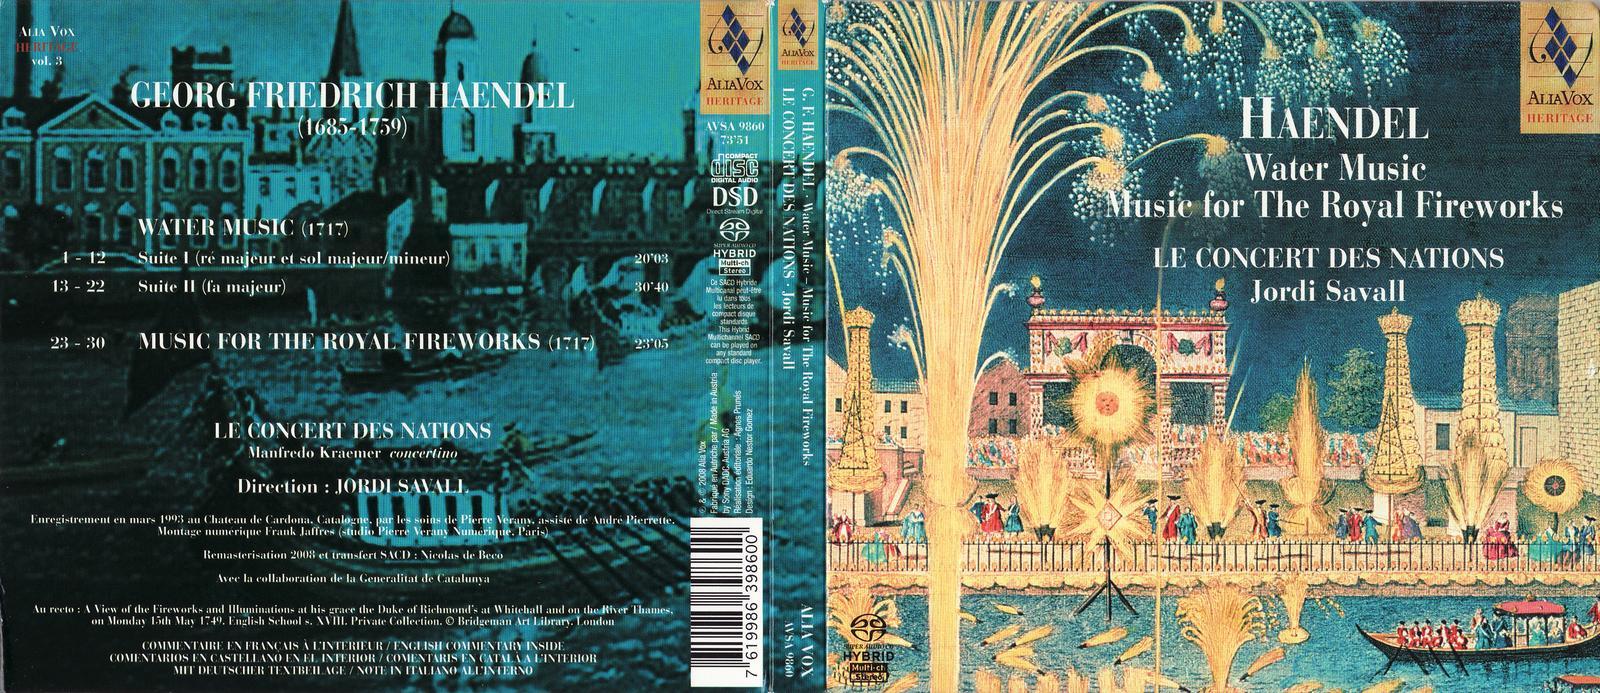 Blog music: Handel: Water Music, Music for the Royal Fireworks